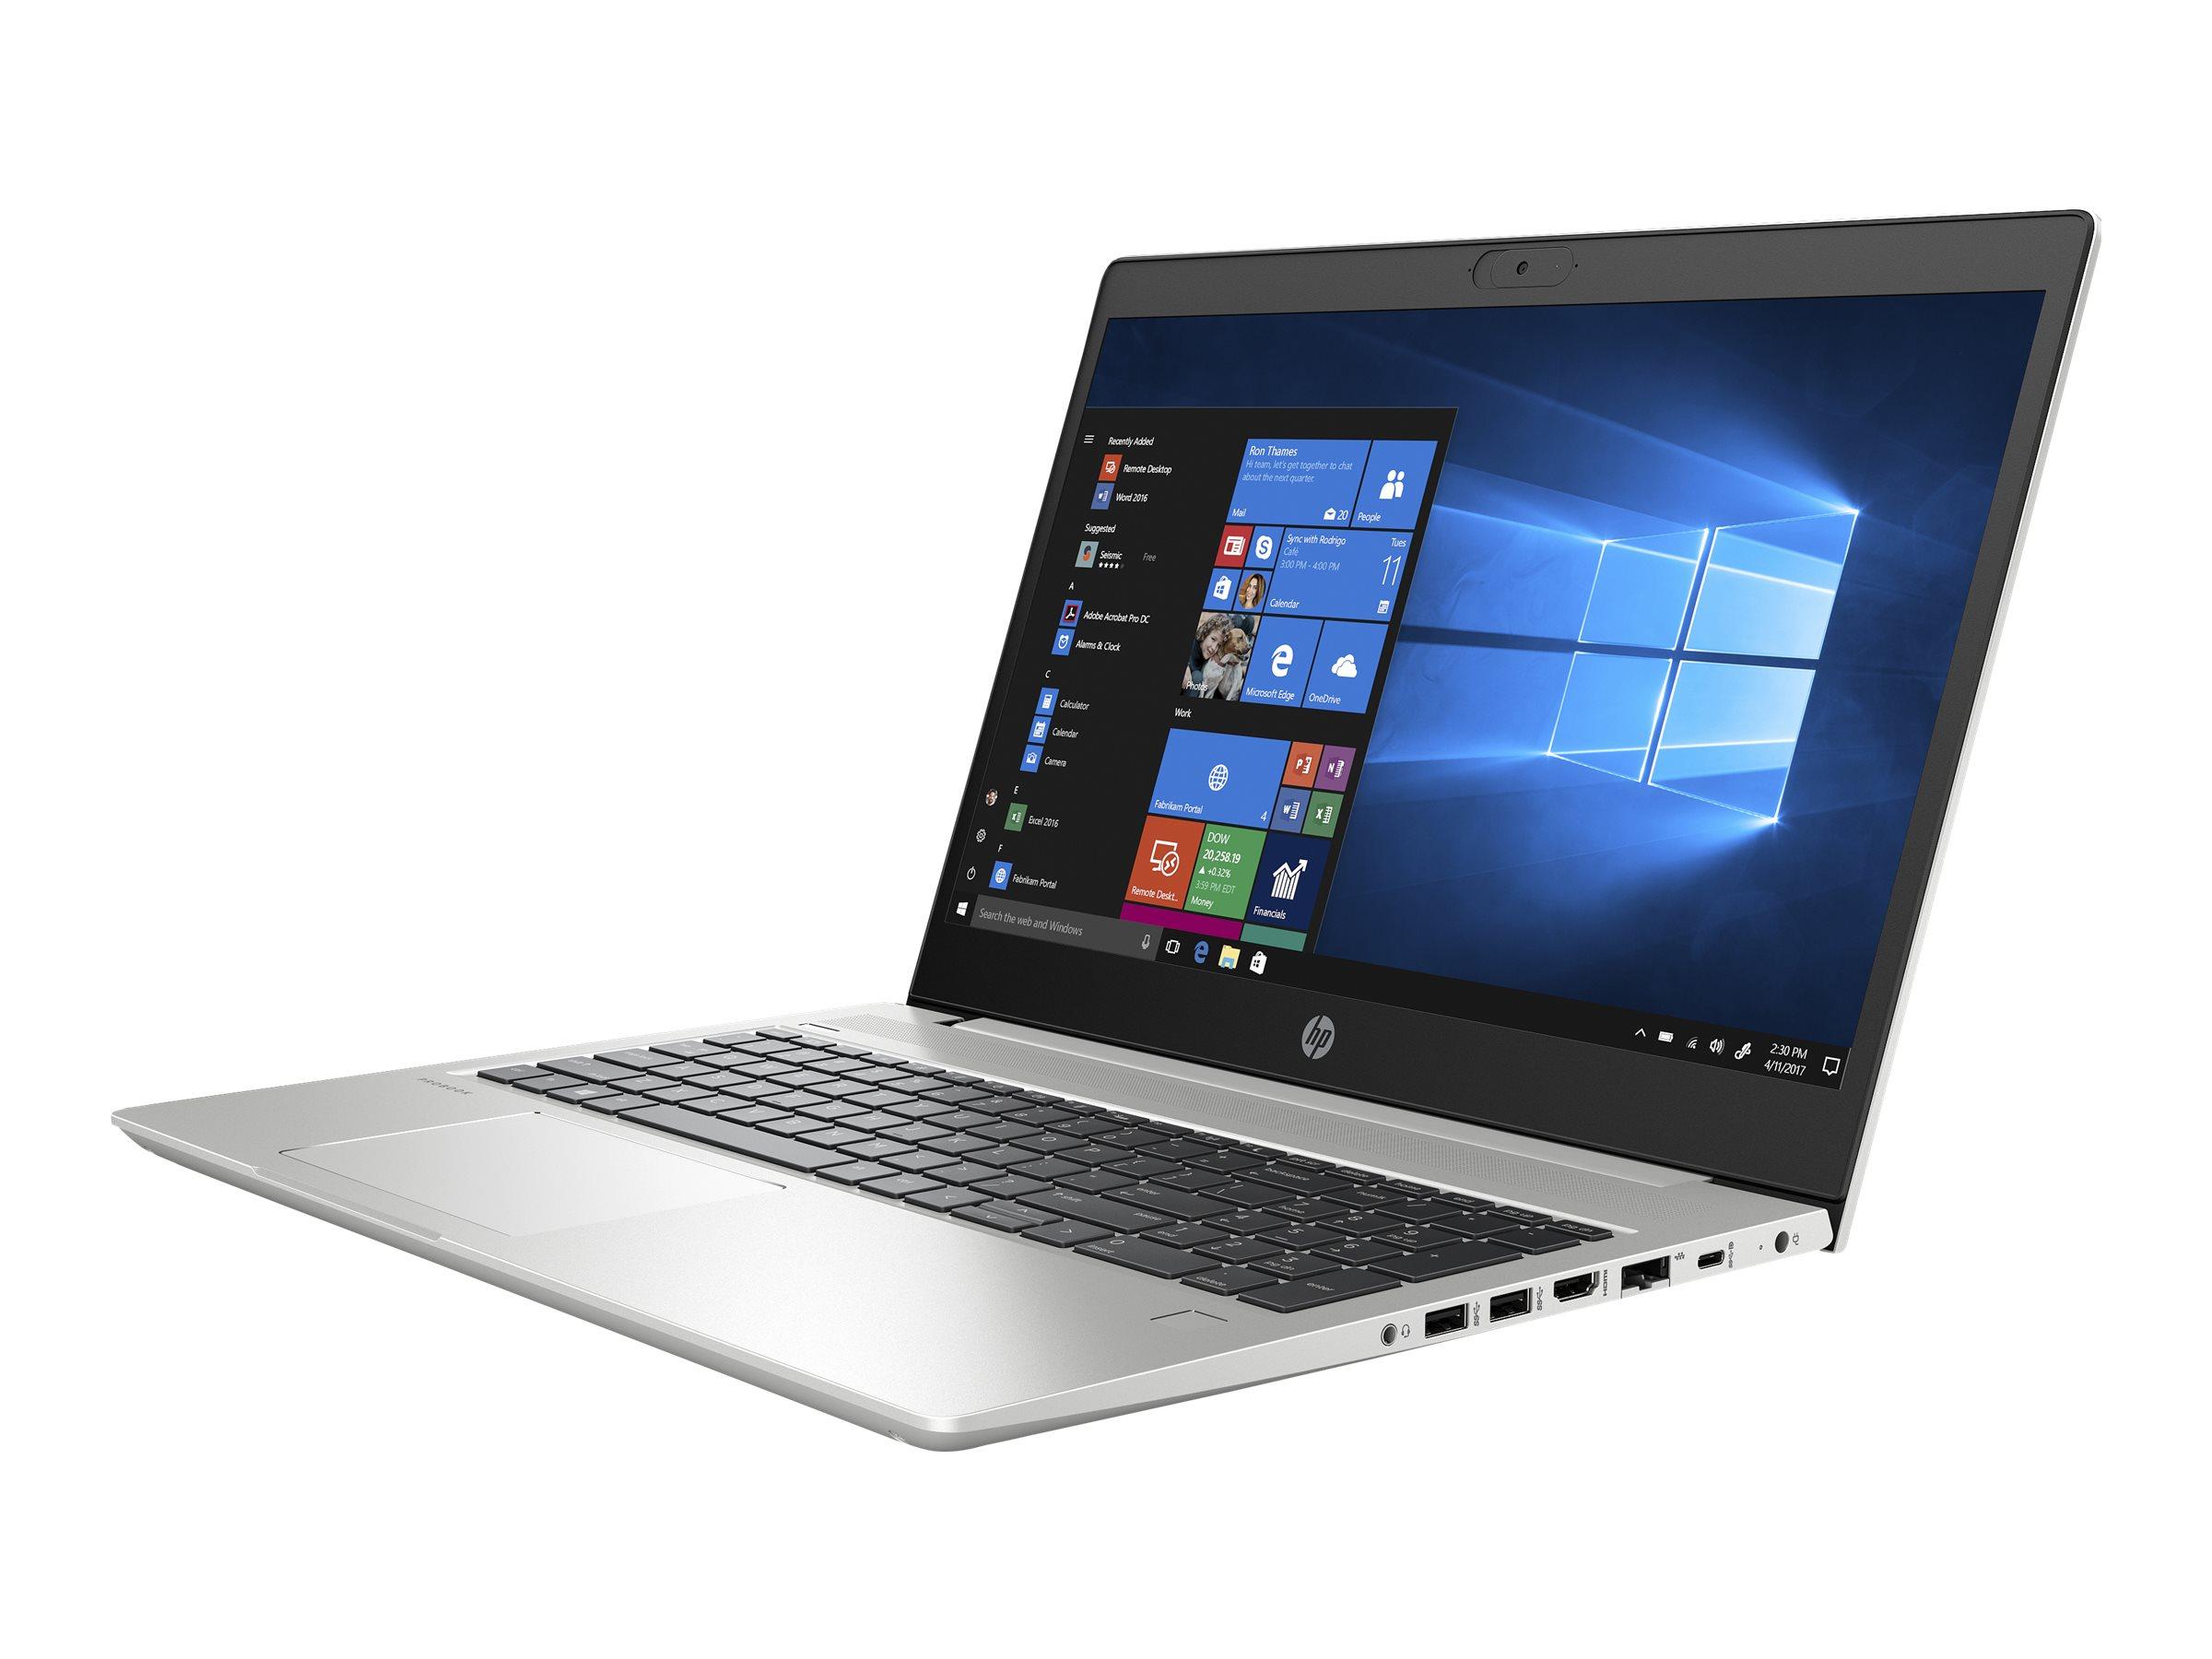 "[Easynotebooks] HP ProBook 455 G7 Pike Silver, 15.6"" IPS, Ryzen 5 4500U, 16GB RAM, 512GB SSD, beleuchtete Tastatur, FPR, Win10 Pro"